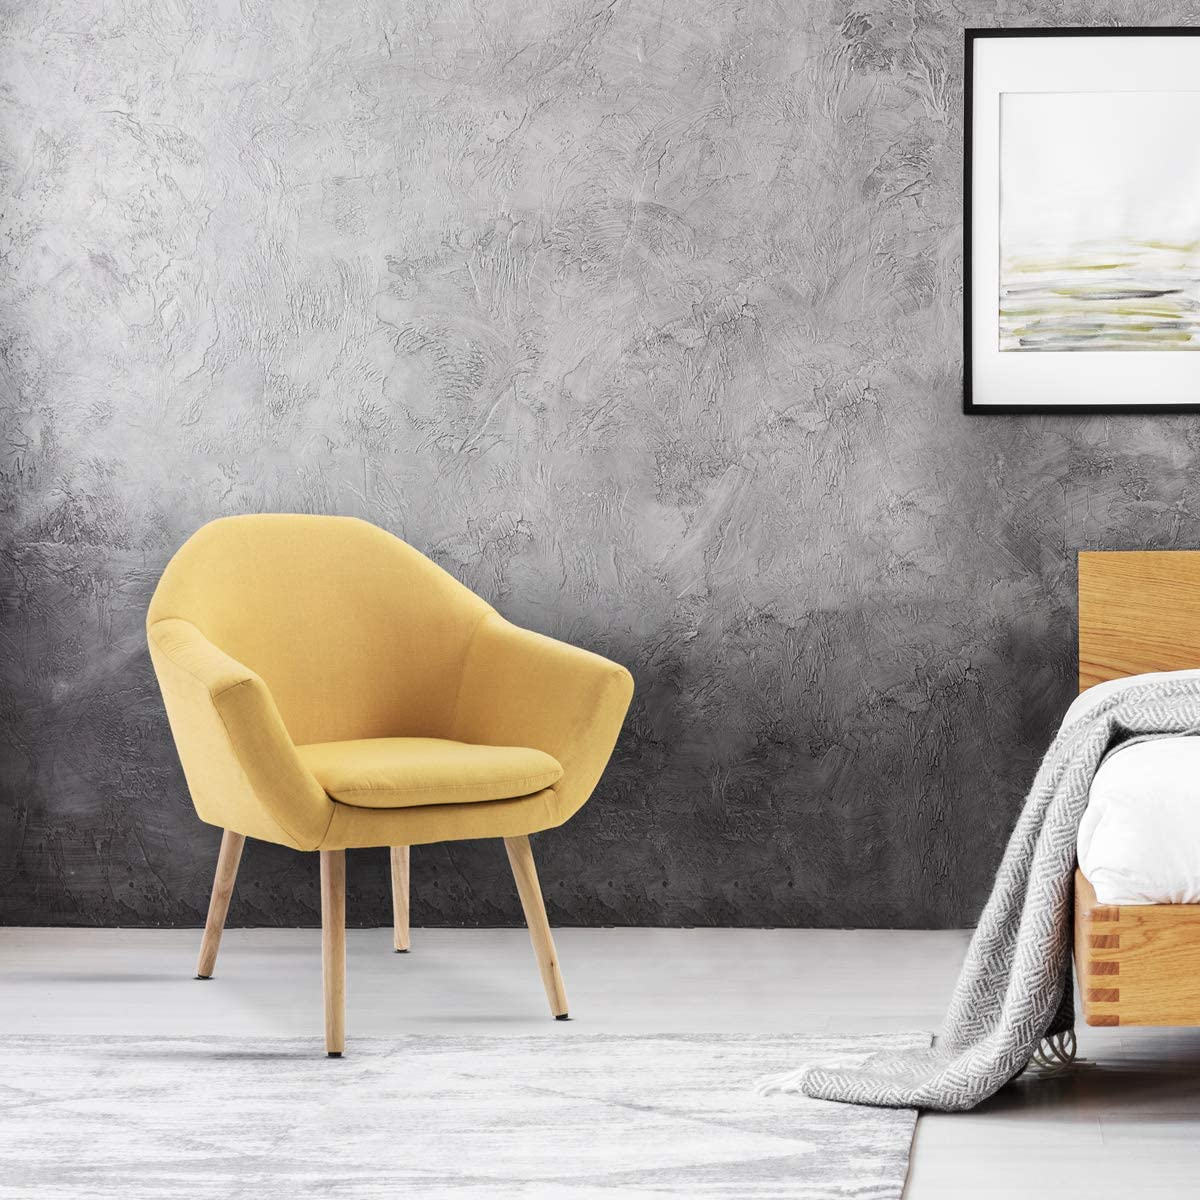 Mc Haus NAVIAN - Sillón Nórdico Escandinavo de color Mostaza, butaca comedor salón dormitorio, sillón acolchado con Reposabrazos y patas de madera 74x64x76cm